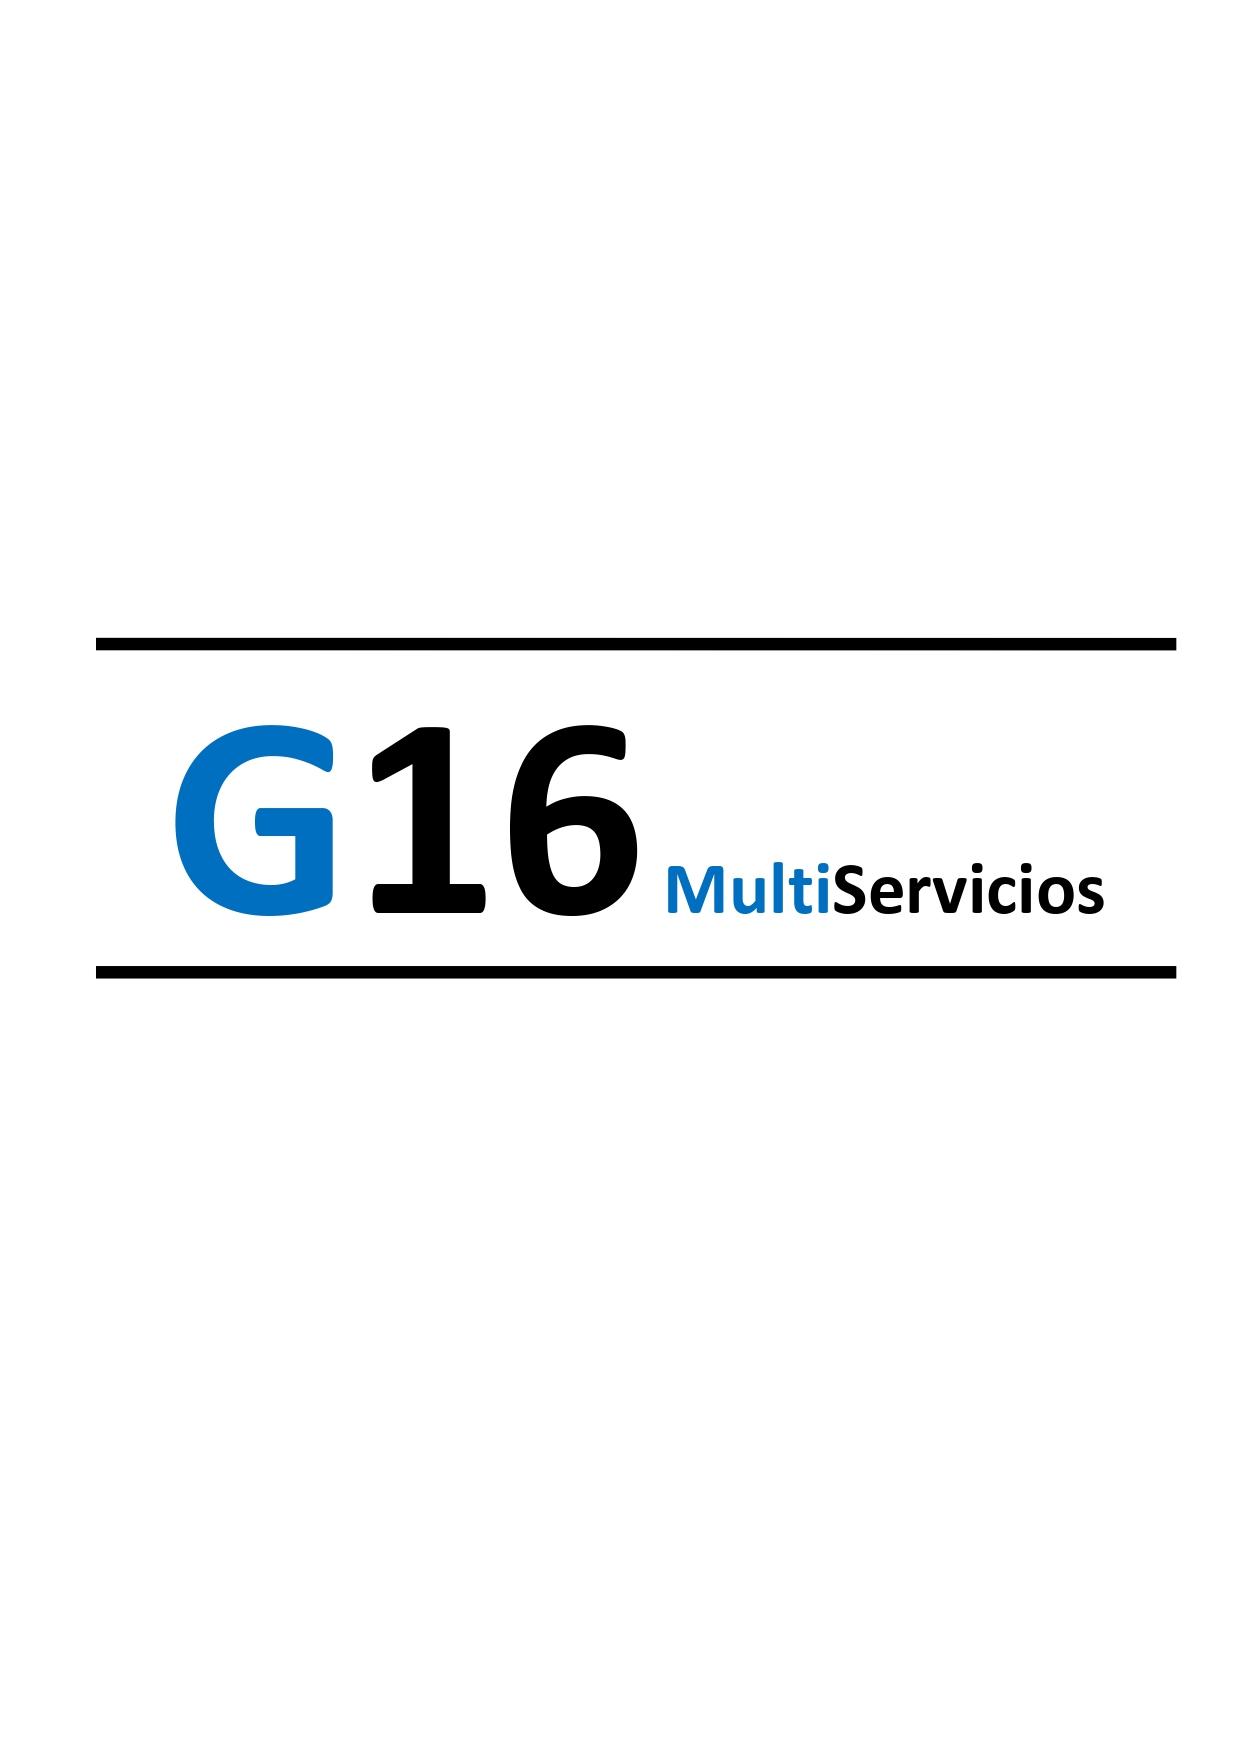 G16 Multiservicios